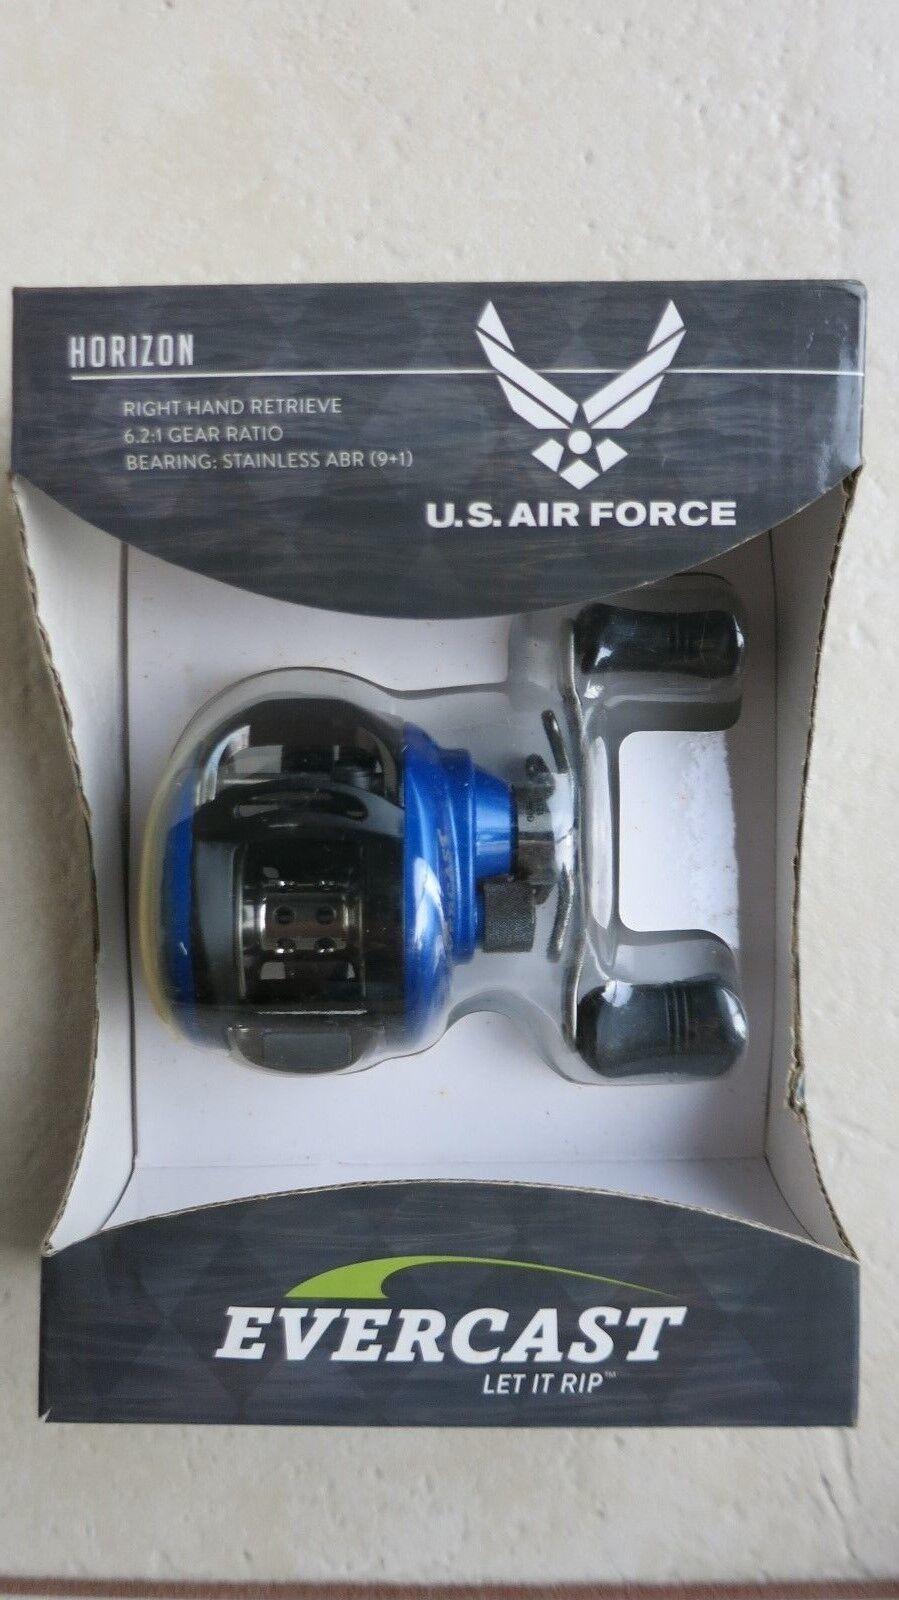 Evercast Horizon U.S. Air Force Fishing Reel bleu - Right Hand Retrieve 6.2 1